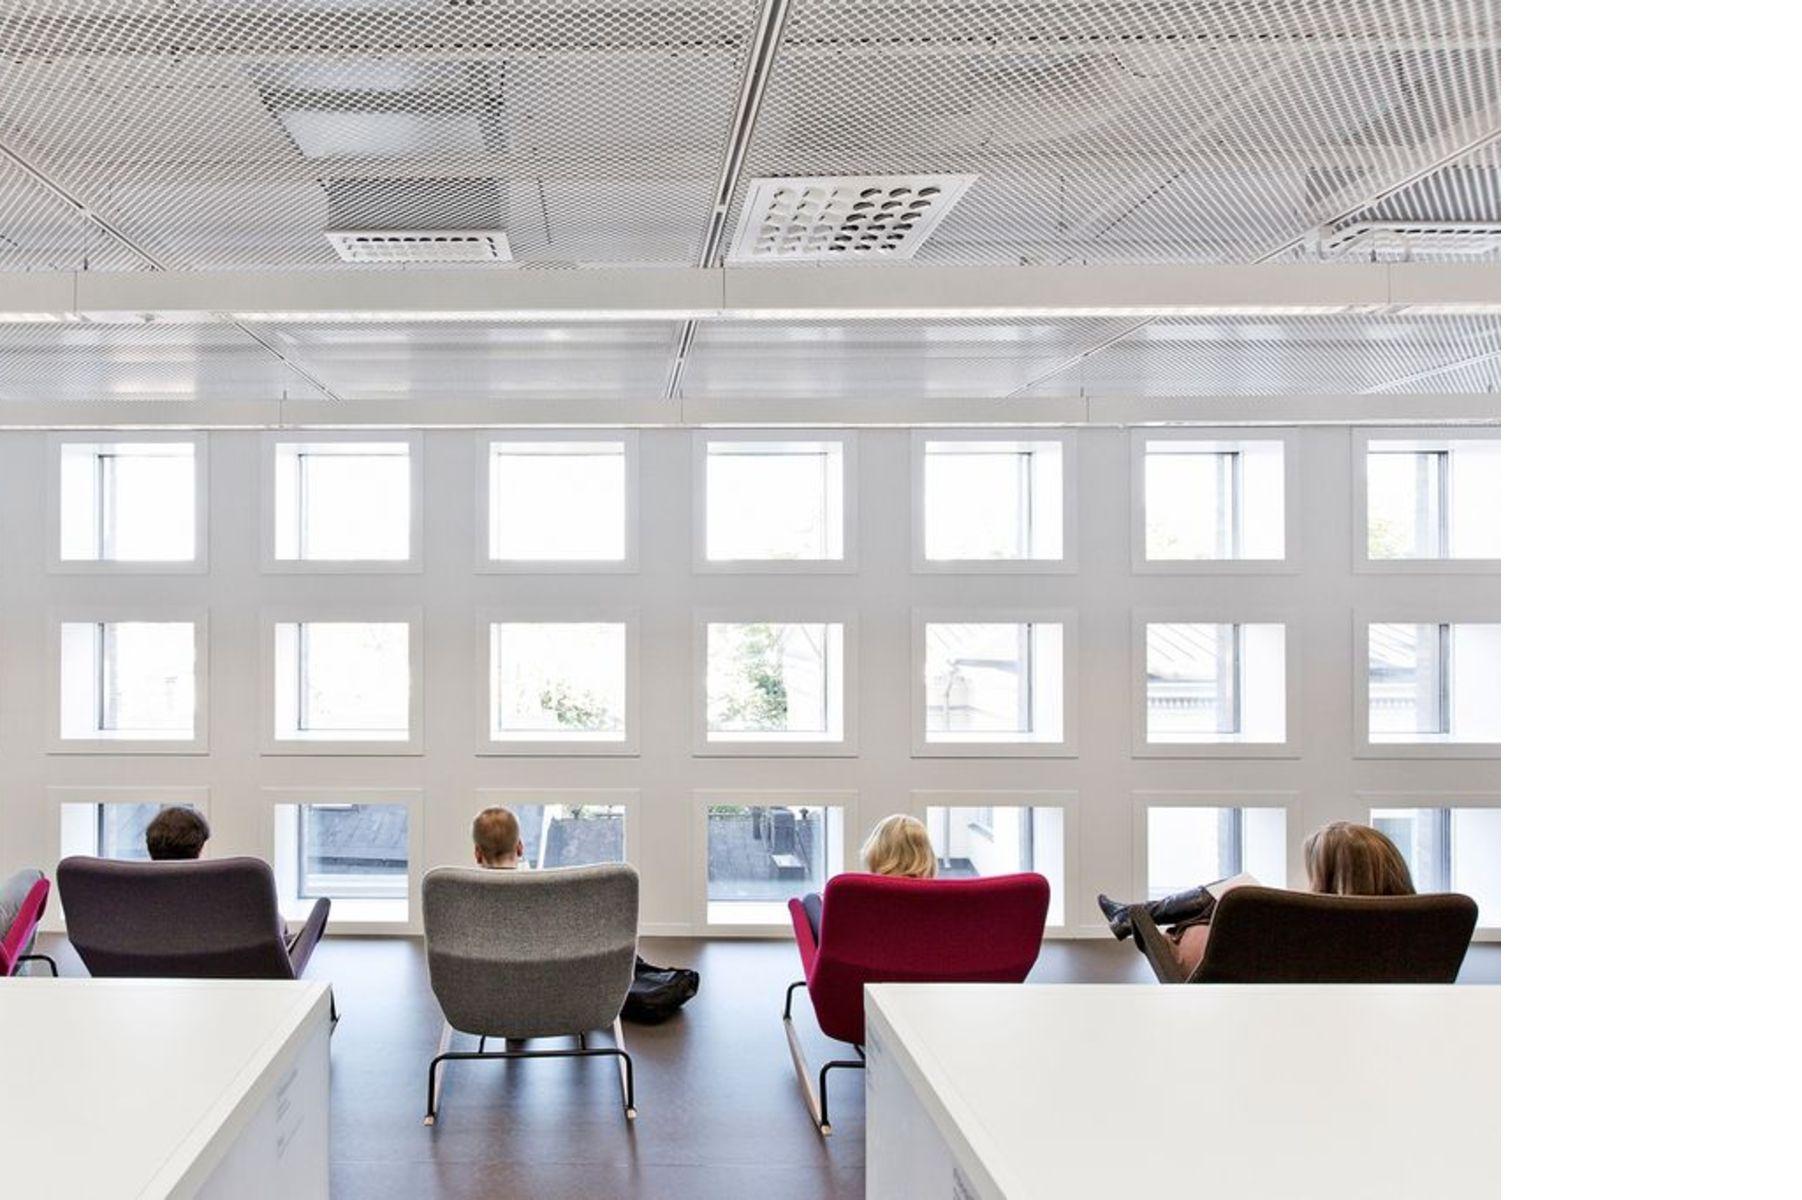 Anttinen Oiva e la Helsinki University Main Library (Kaisa house)